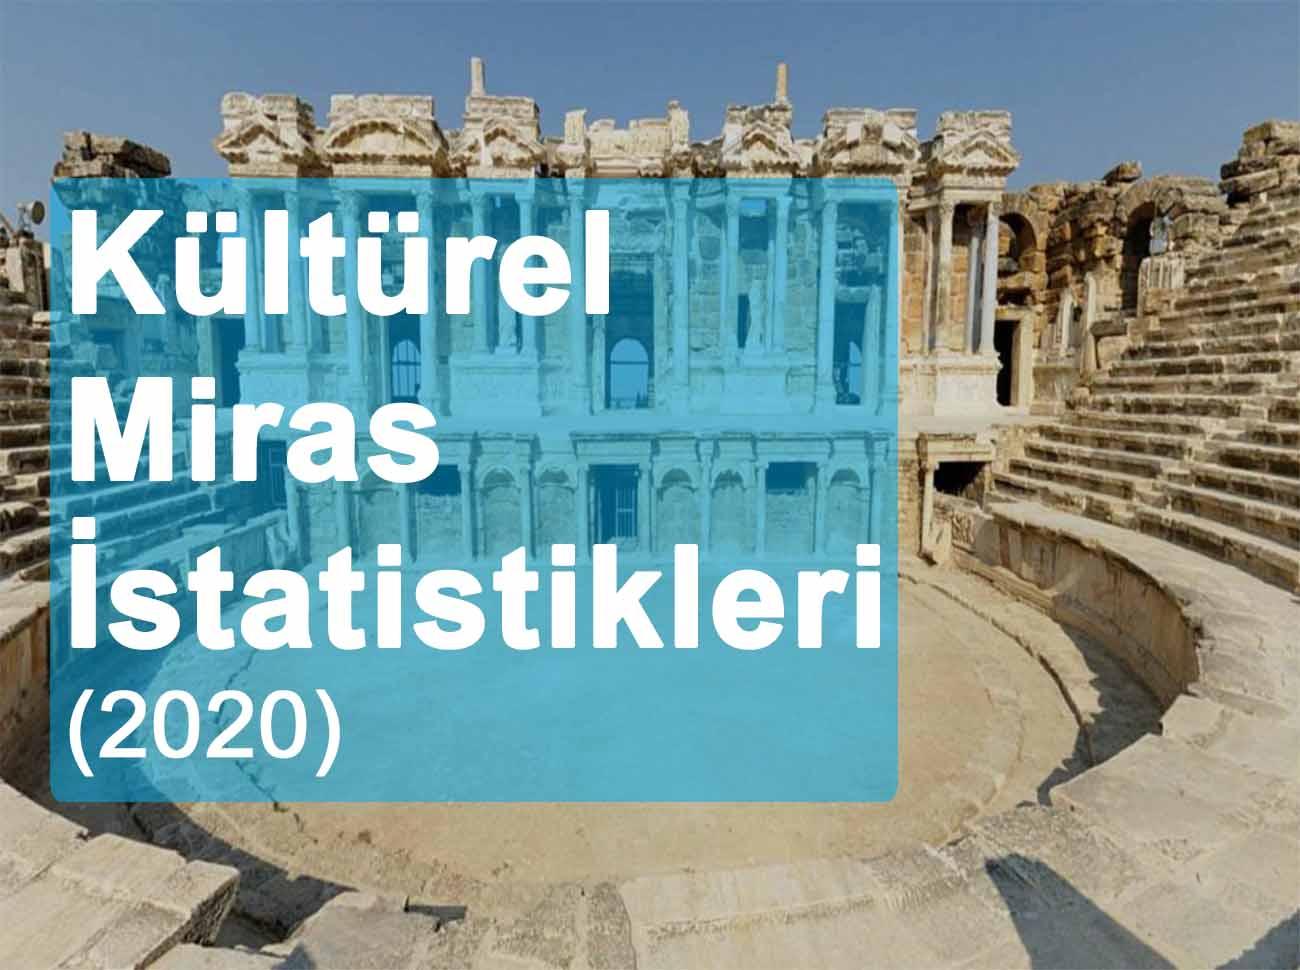 Kültürel Miras İstatistikleri (2020)